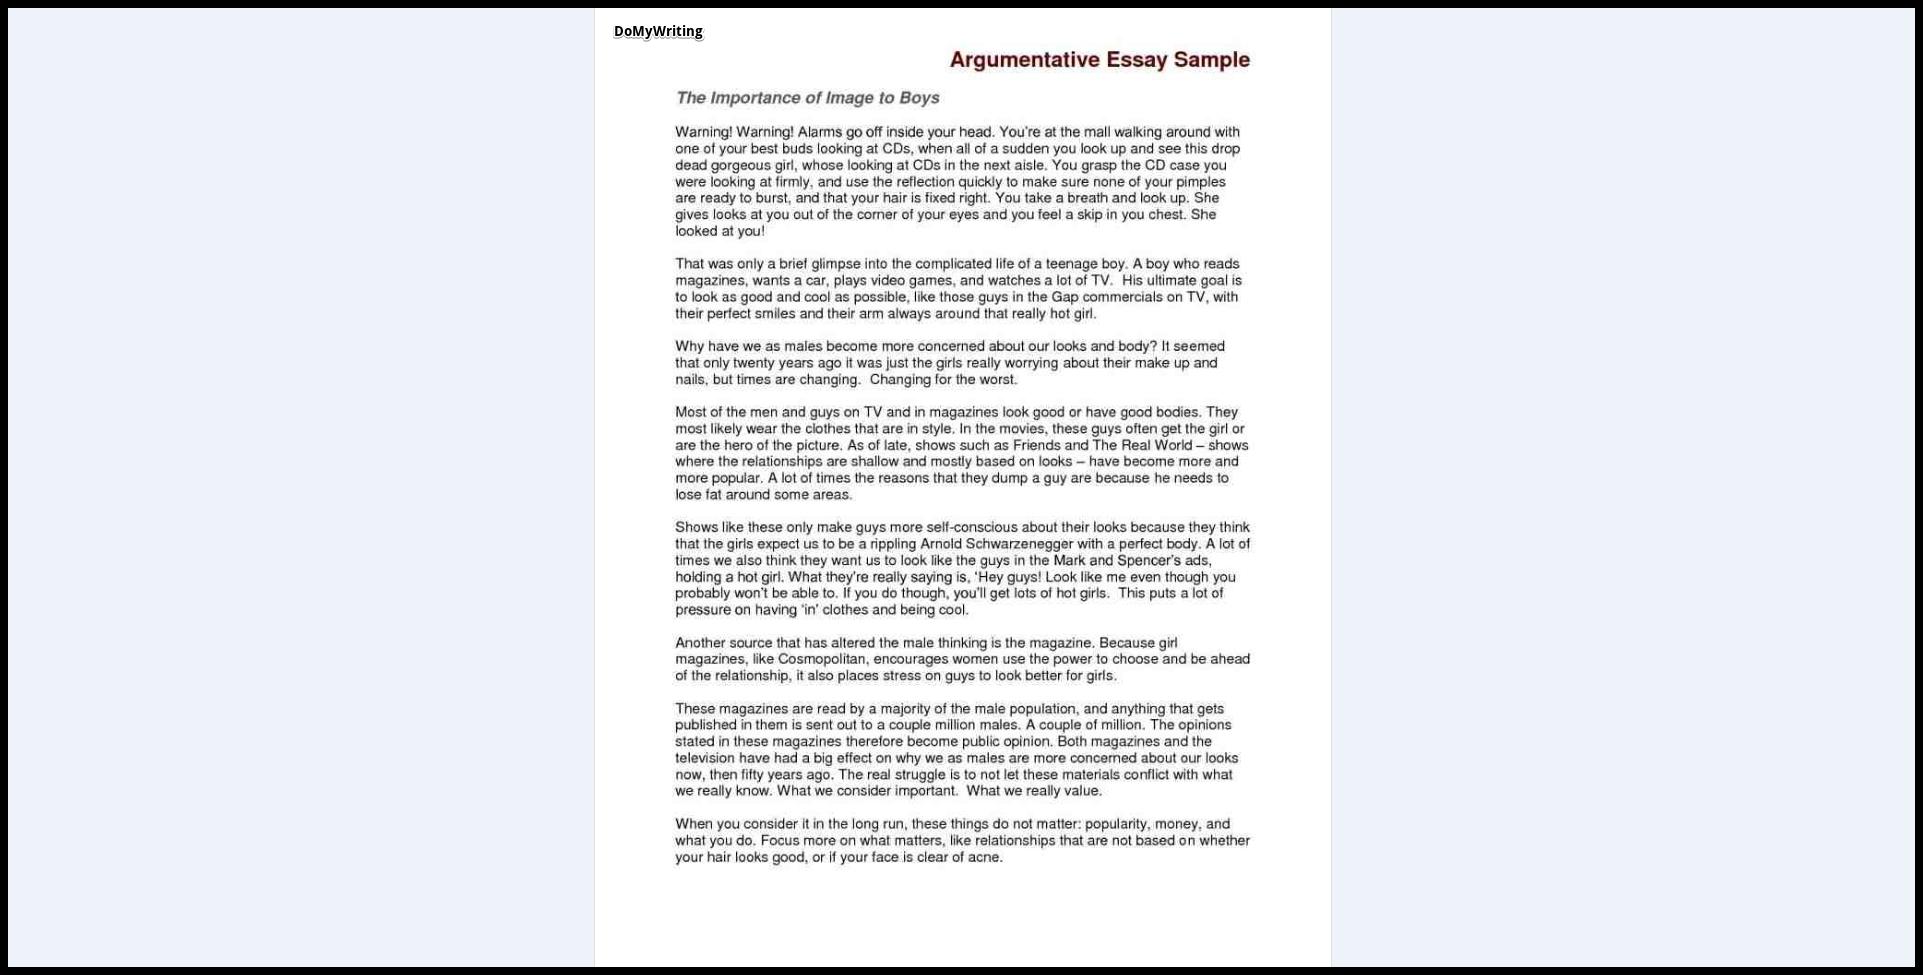 005 Argumentative Essay Sample Good Topics For Discursive Wonderful A National 5 Interesting Persuasive Full